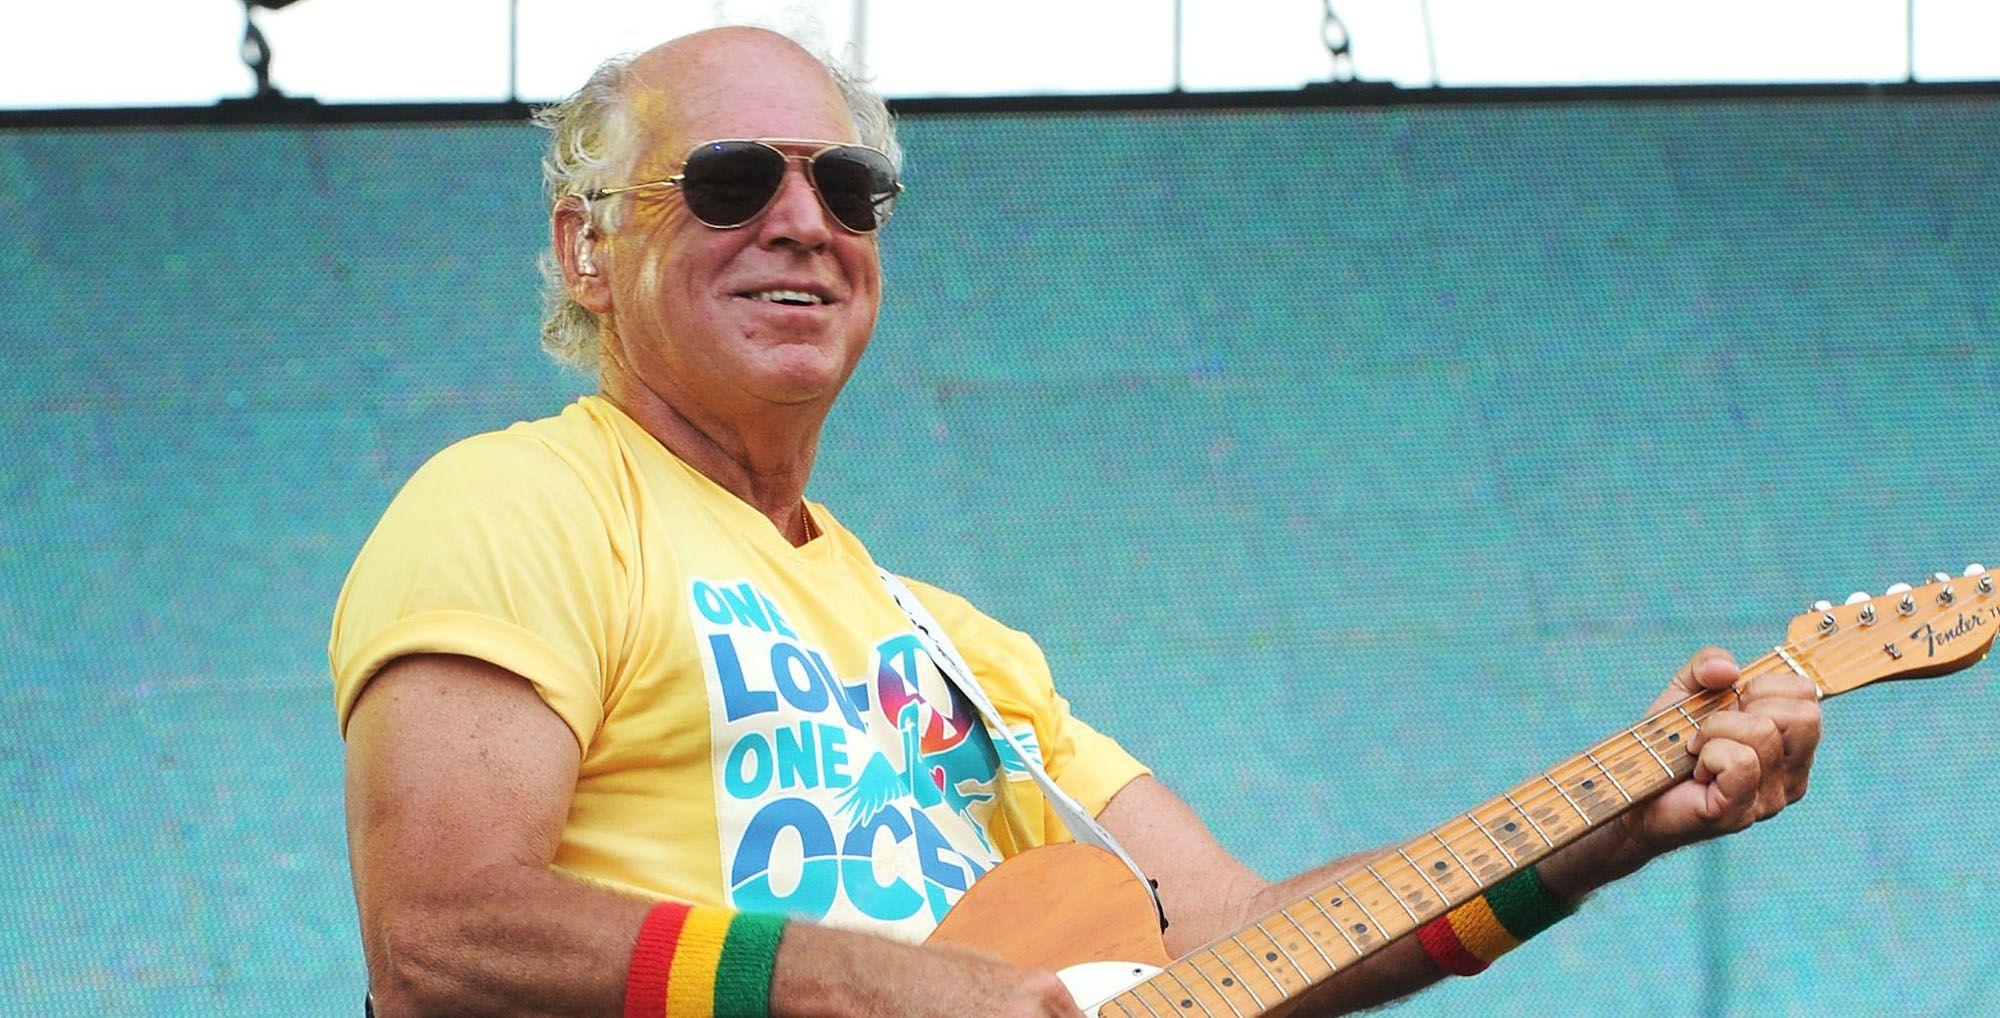 A Florida City Used Jimmy Buffett Lyrics as a Legal Defense (They Lost)